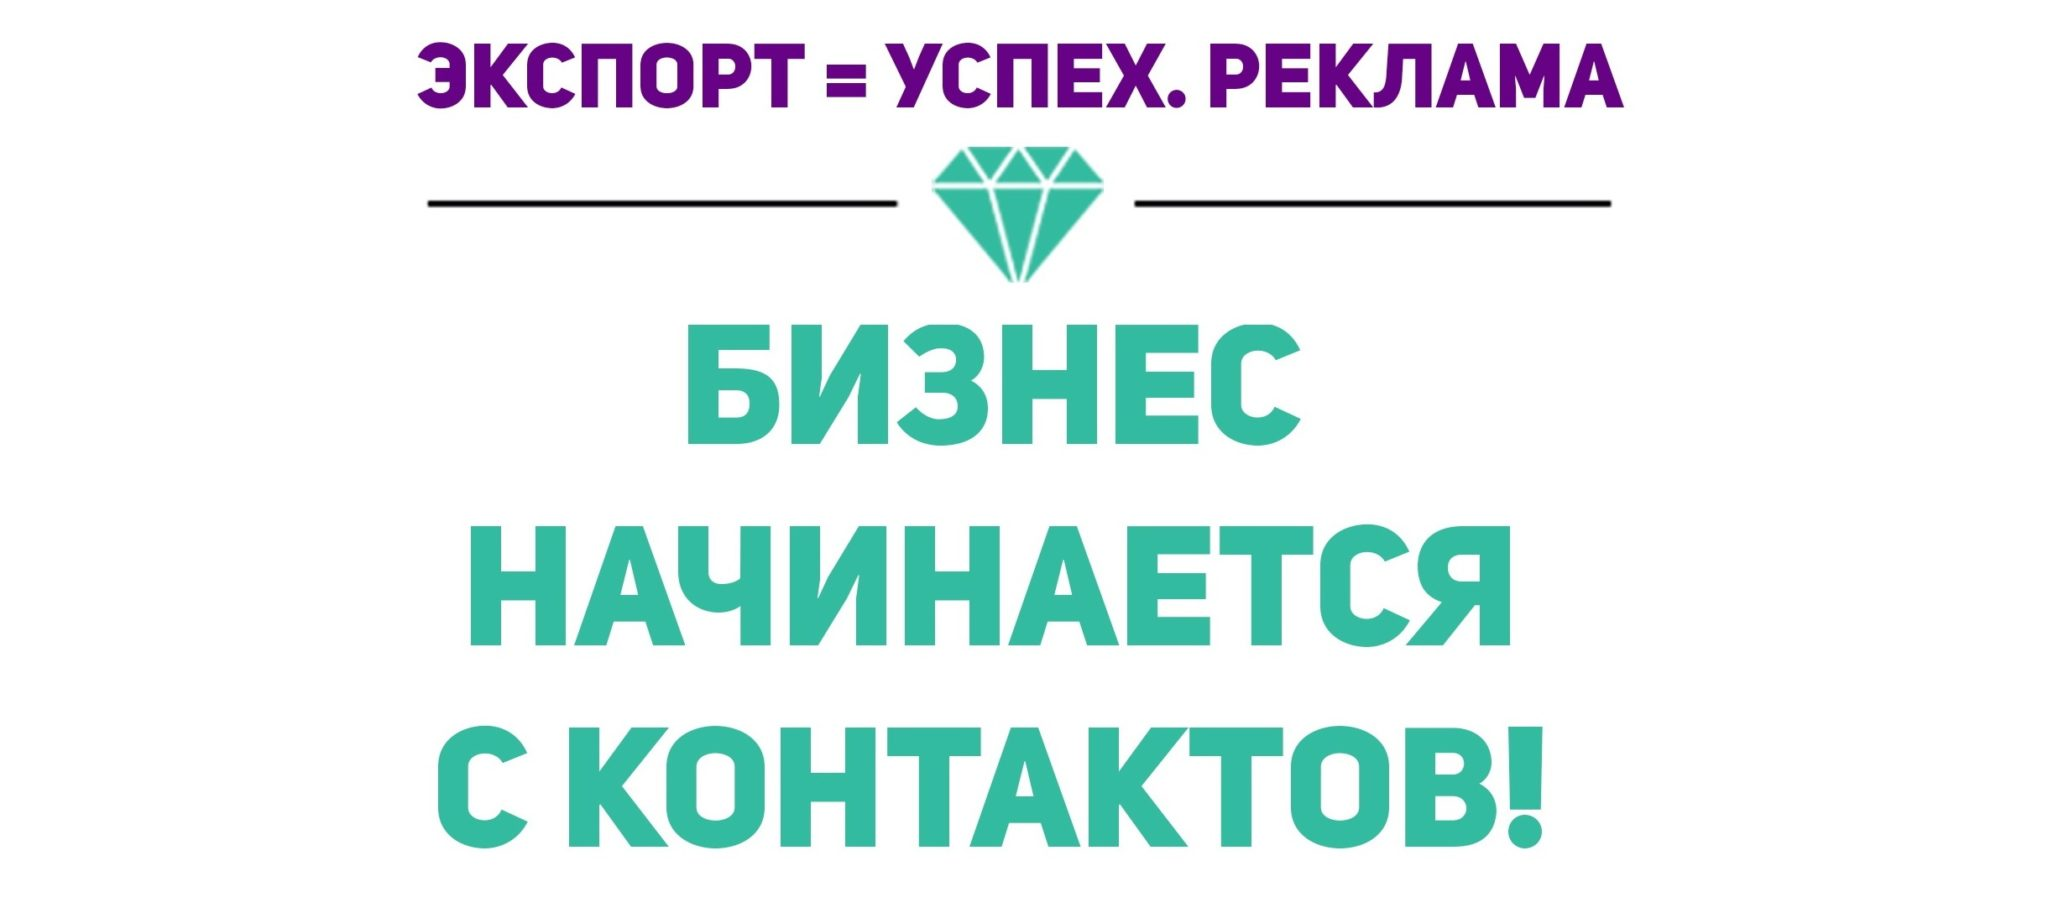 «Экспорт = Успех. РЕКЛАМА» - 28-30 ноября 2014